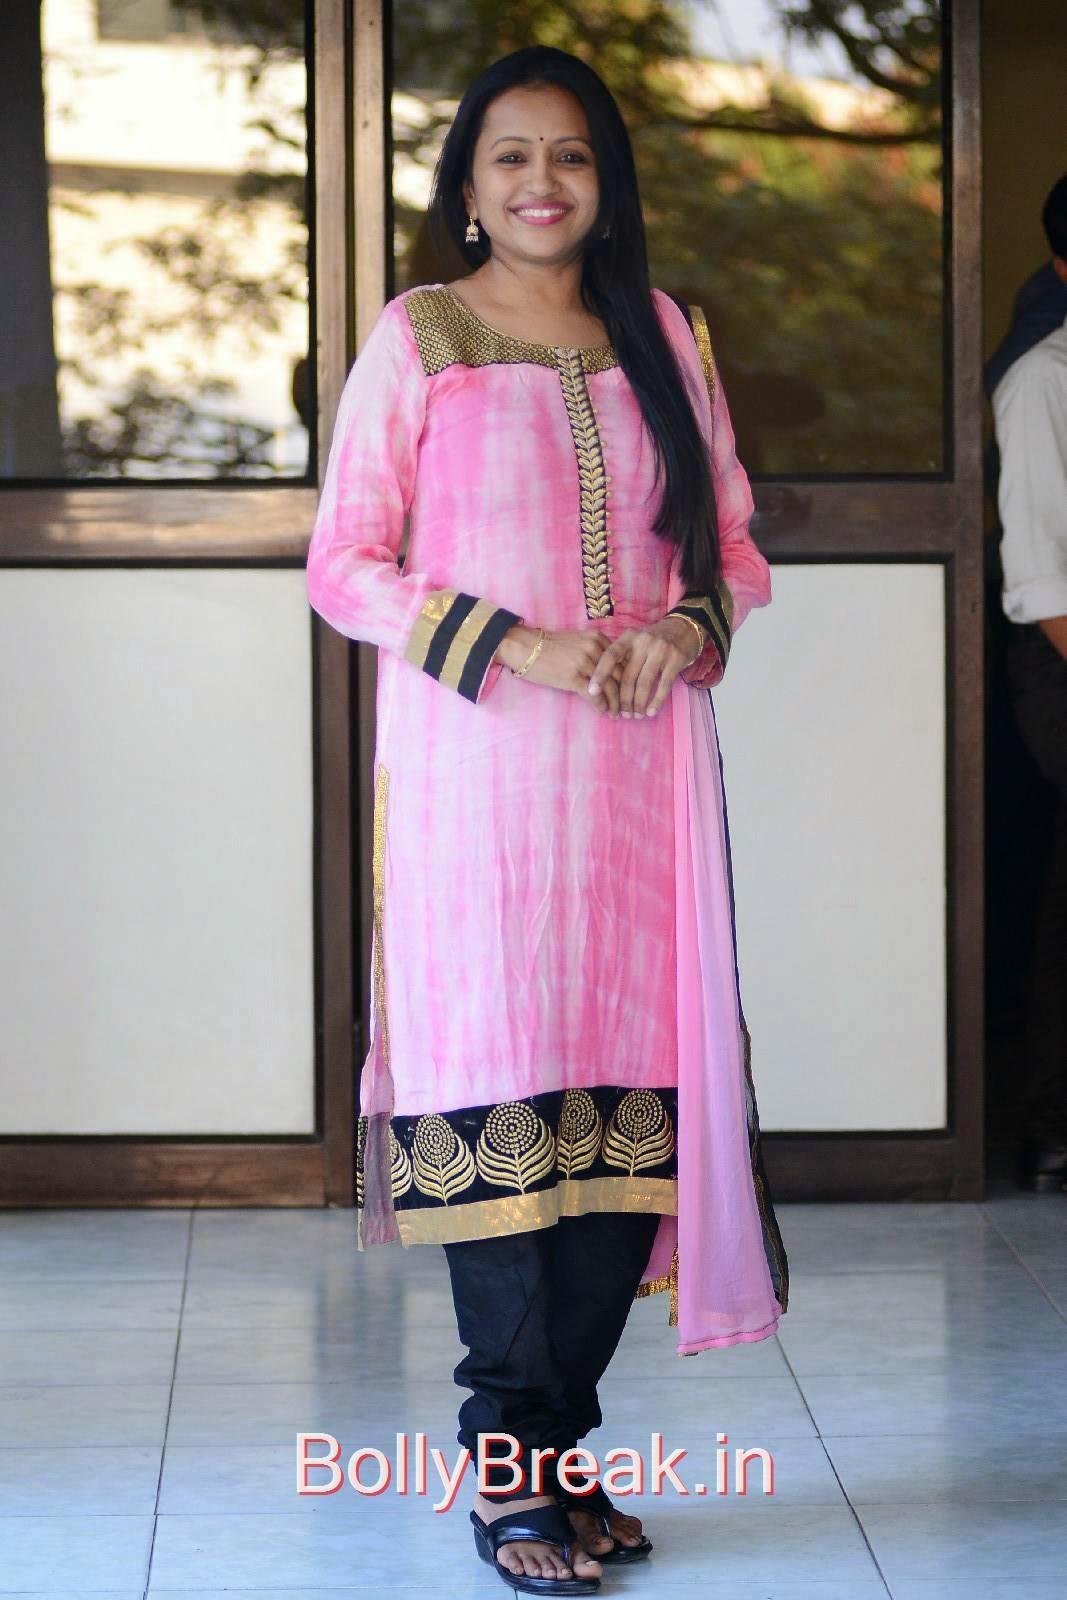 Telugu Anchor Suma, Anchor Suma Hot Hd Pics - GAMA Tollywood Music Awards 2015